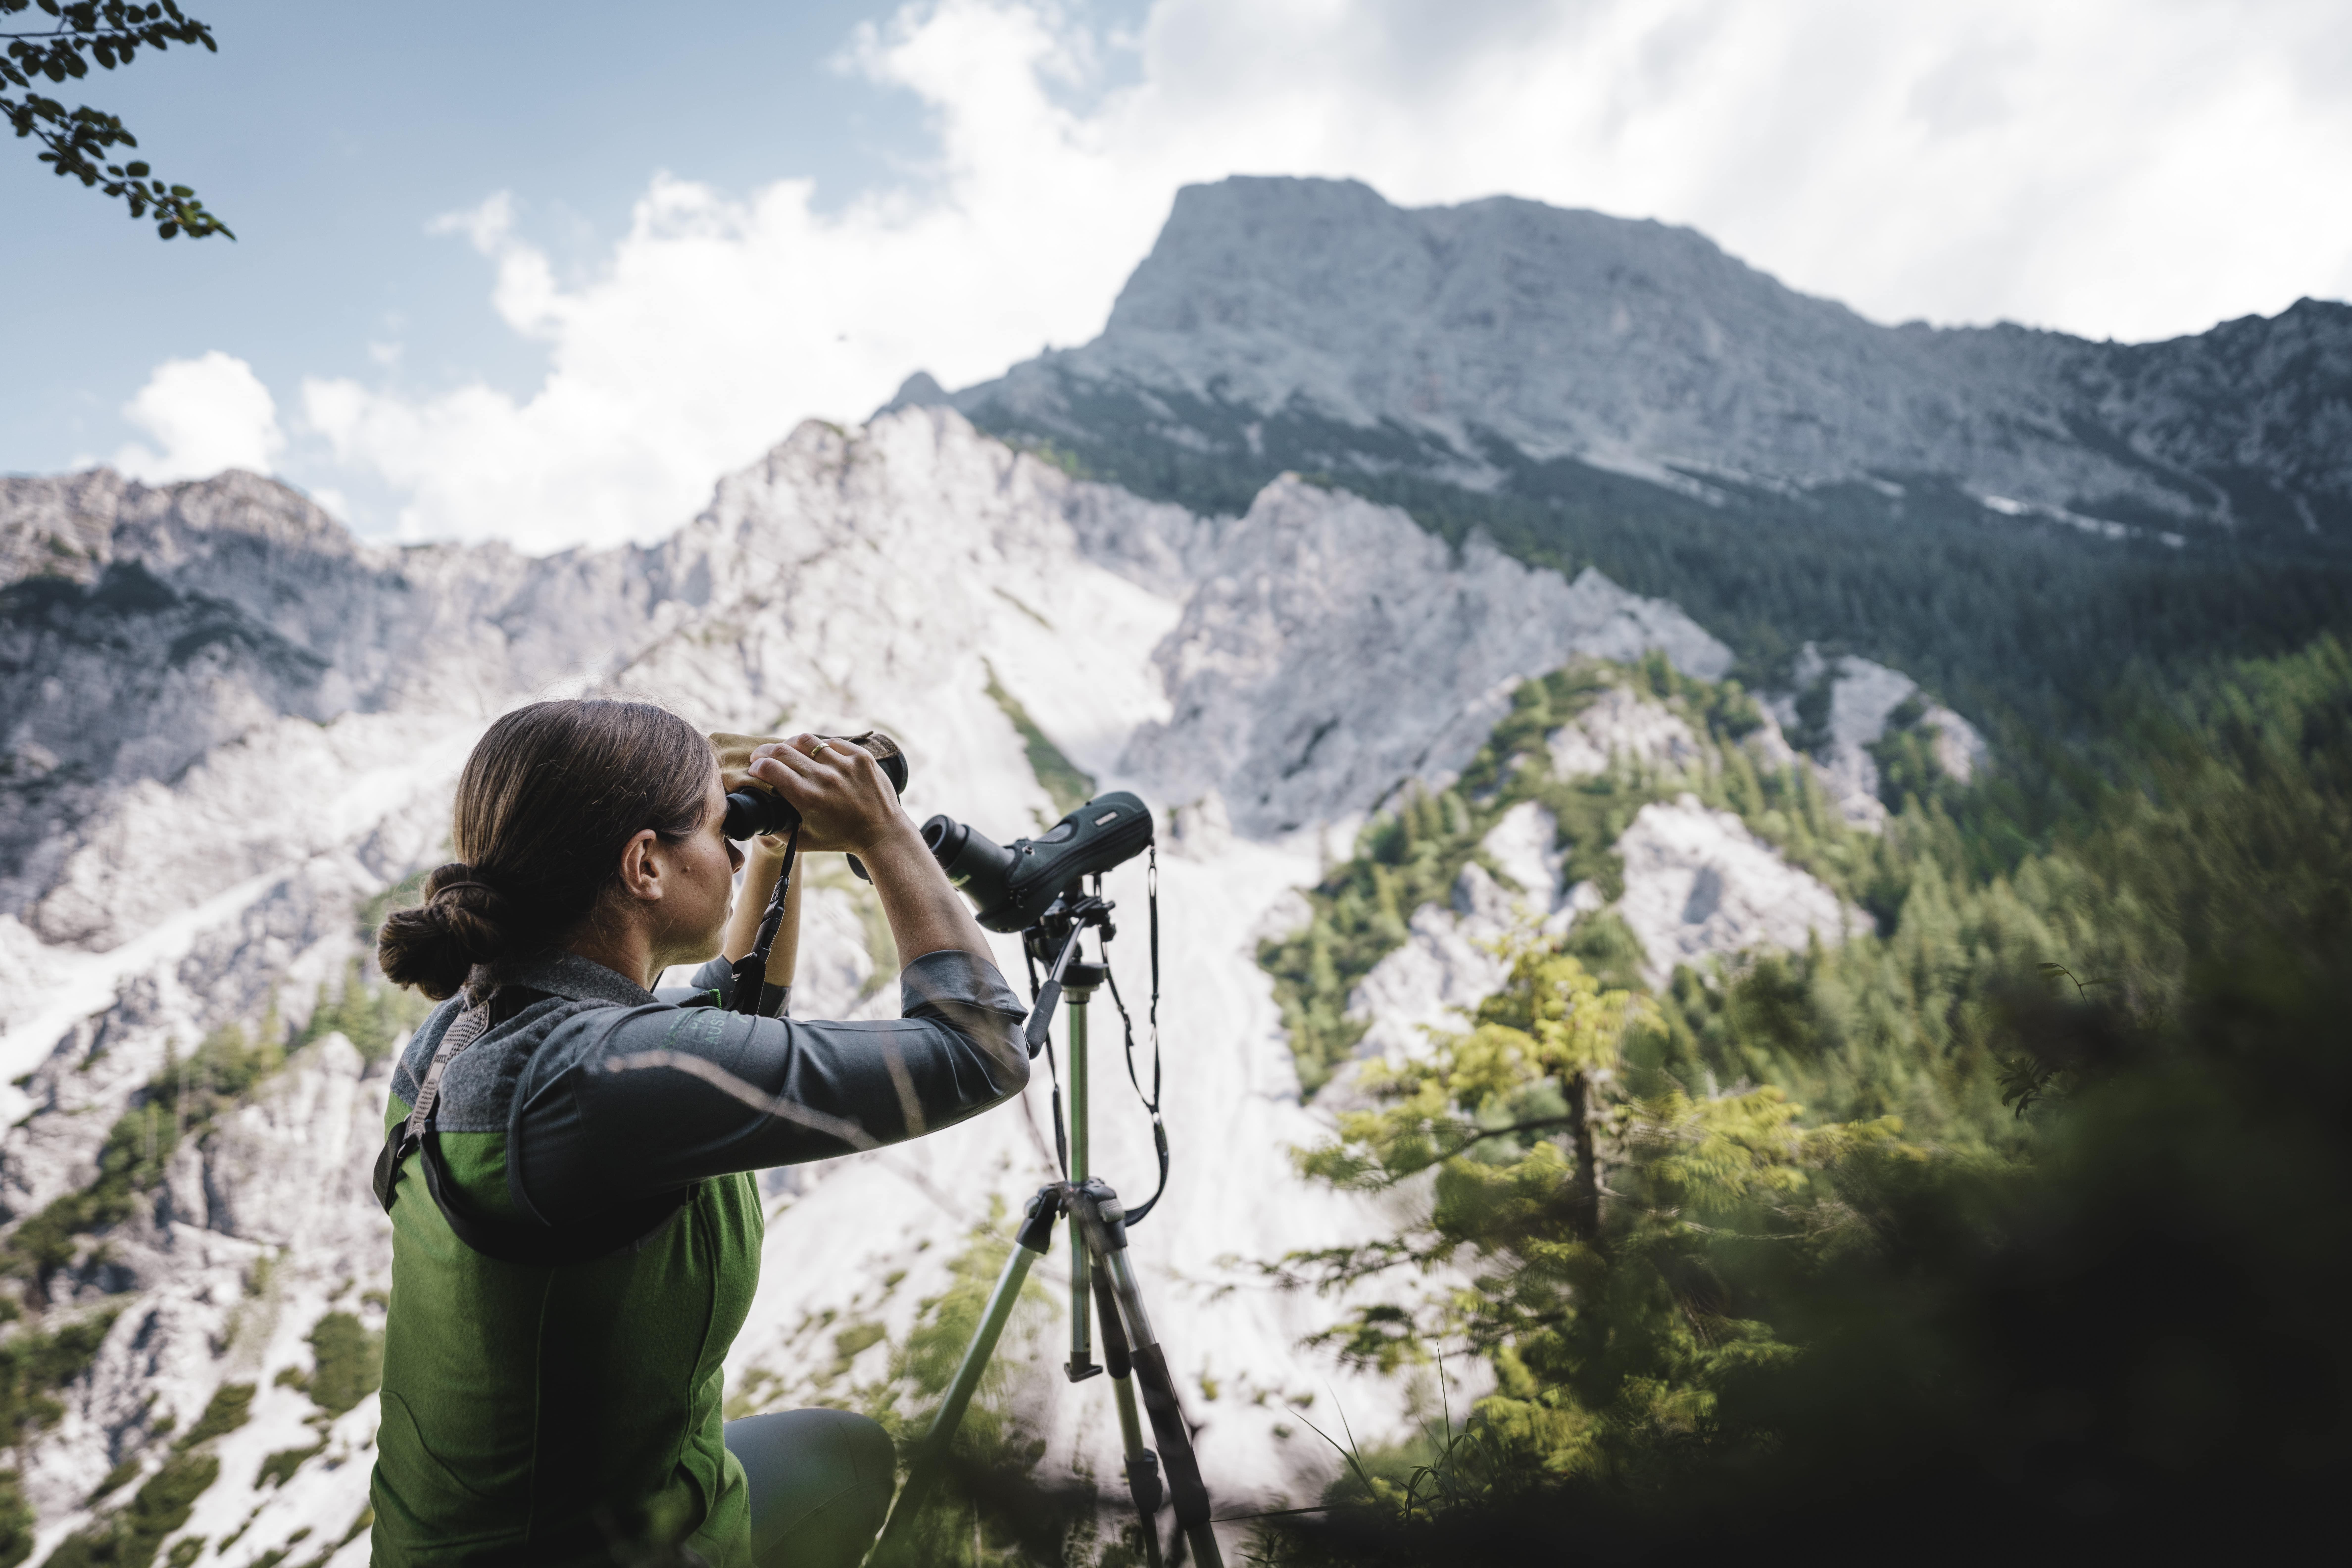 016_Nationalpark_Gesäuse_Naturschutz_Ranger©StefanLeitner_NPG-min